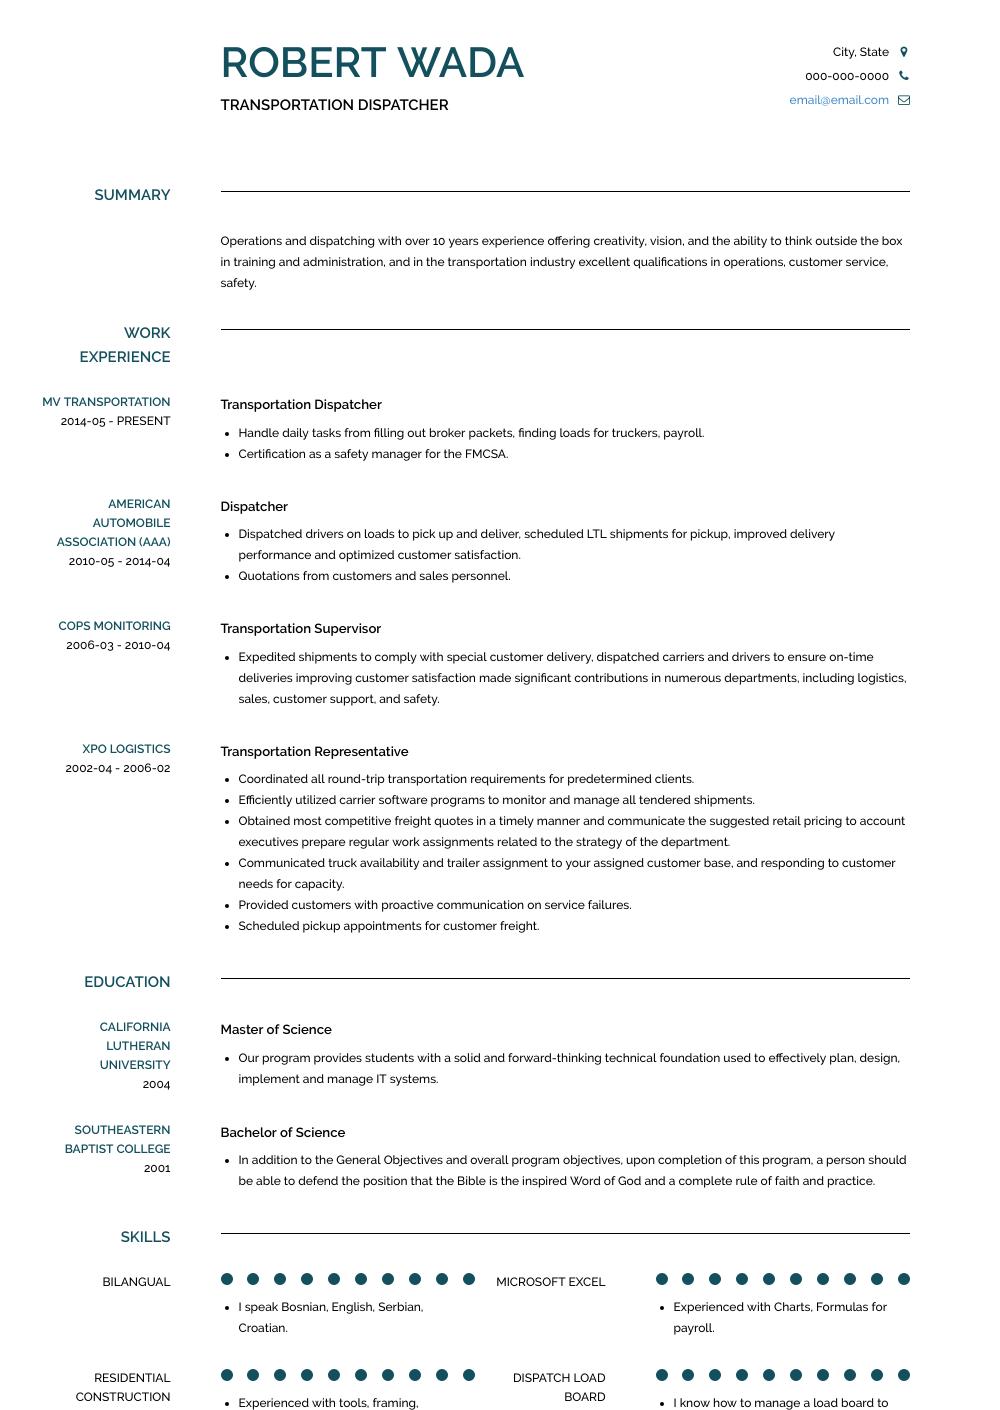 Transportation Dispatcher Resume Sample and Template